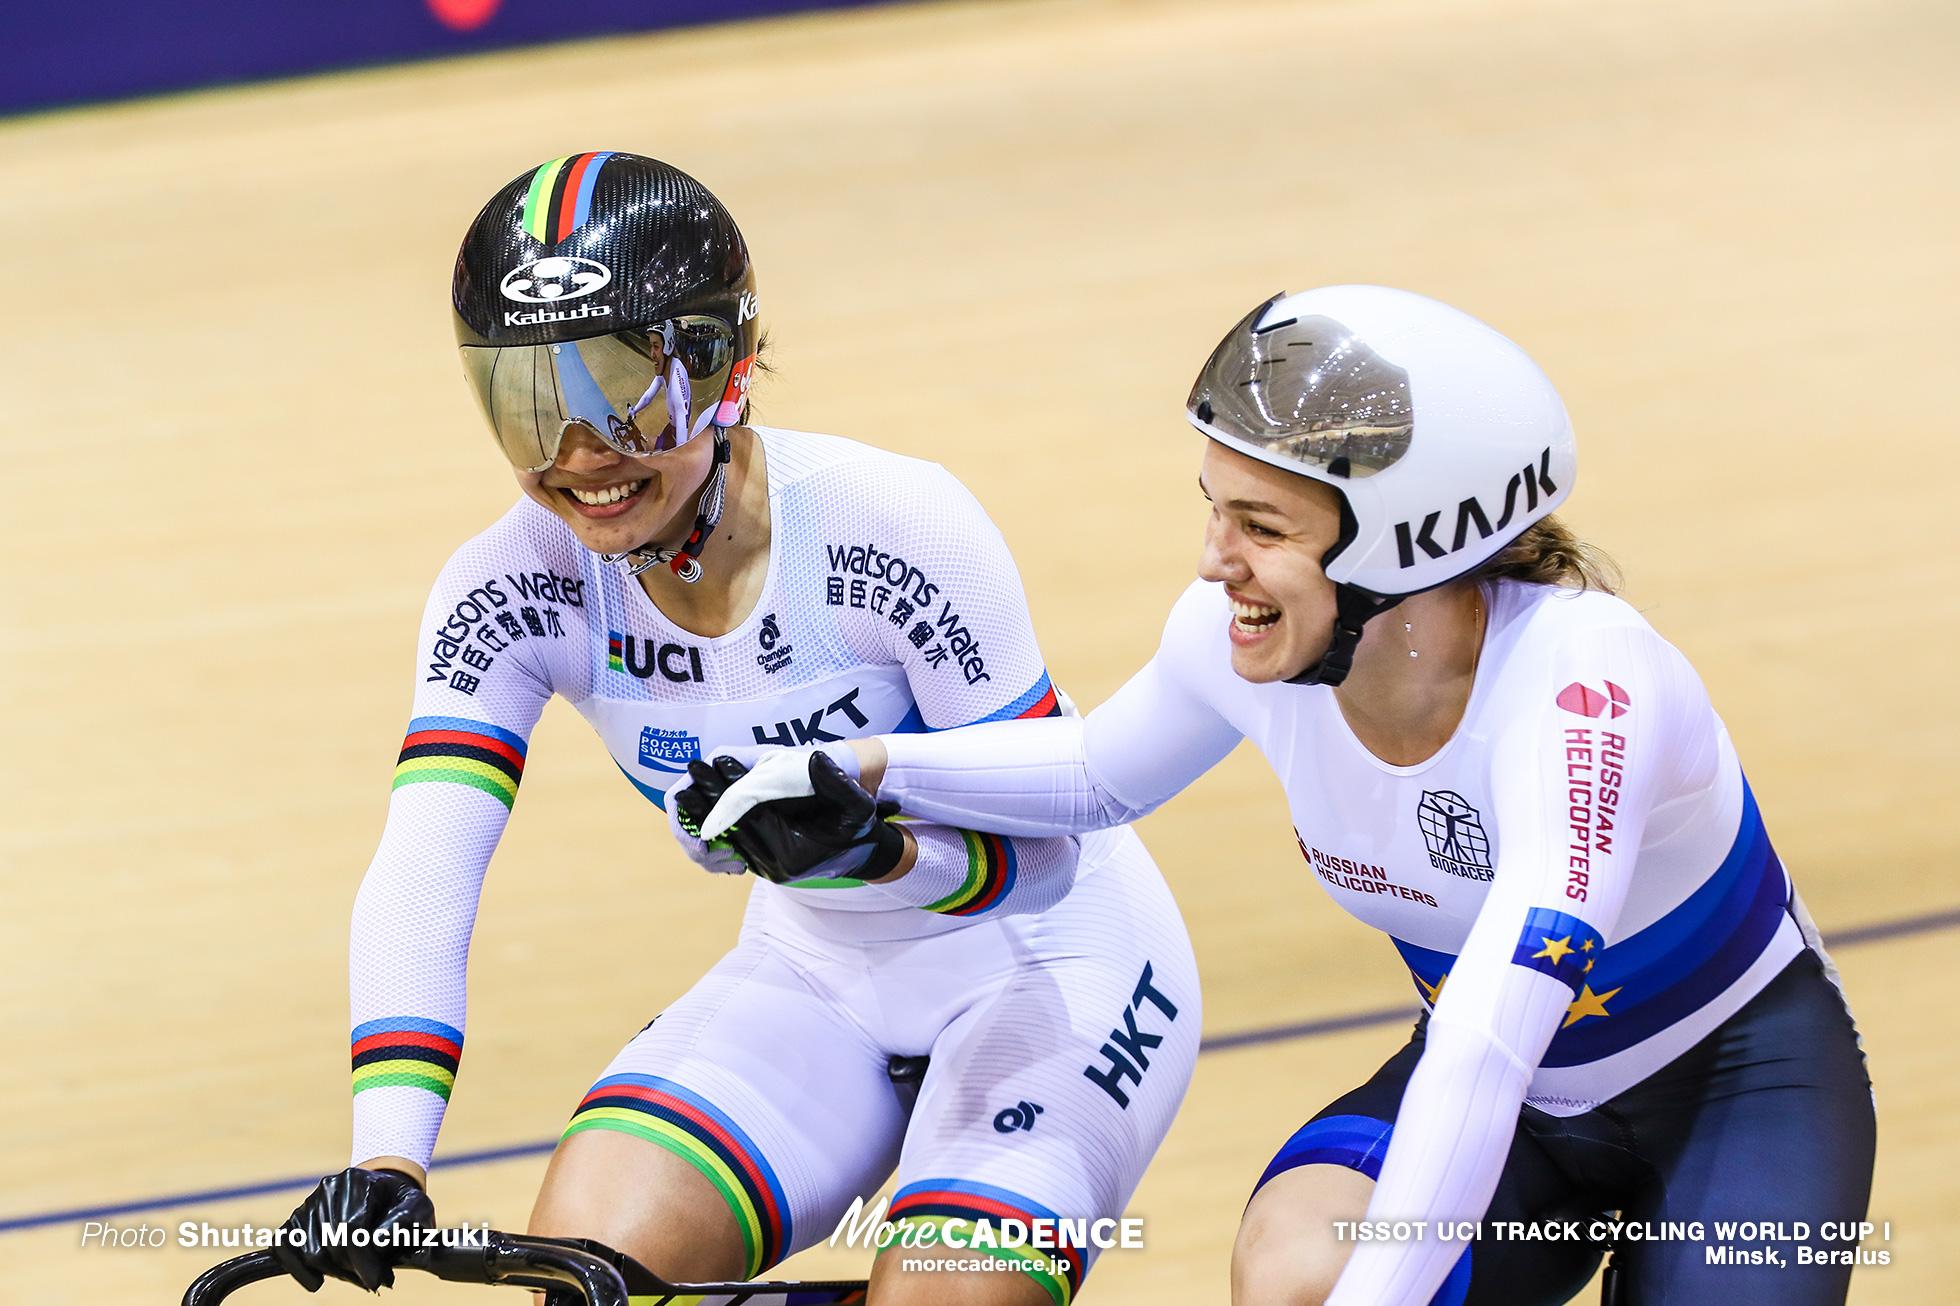 Final / Women's Sprint / TISSOT UCI TRACK CYCLING WORLD CUP I, Minsk, Beralus